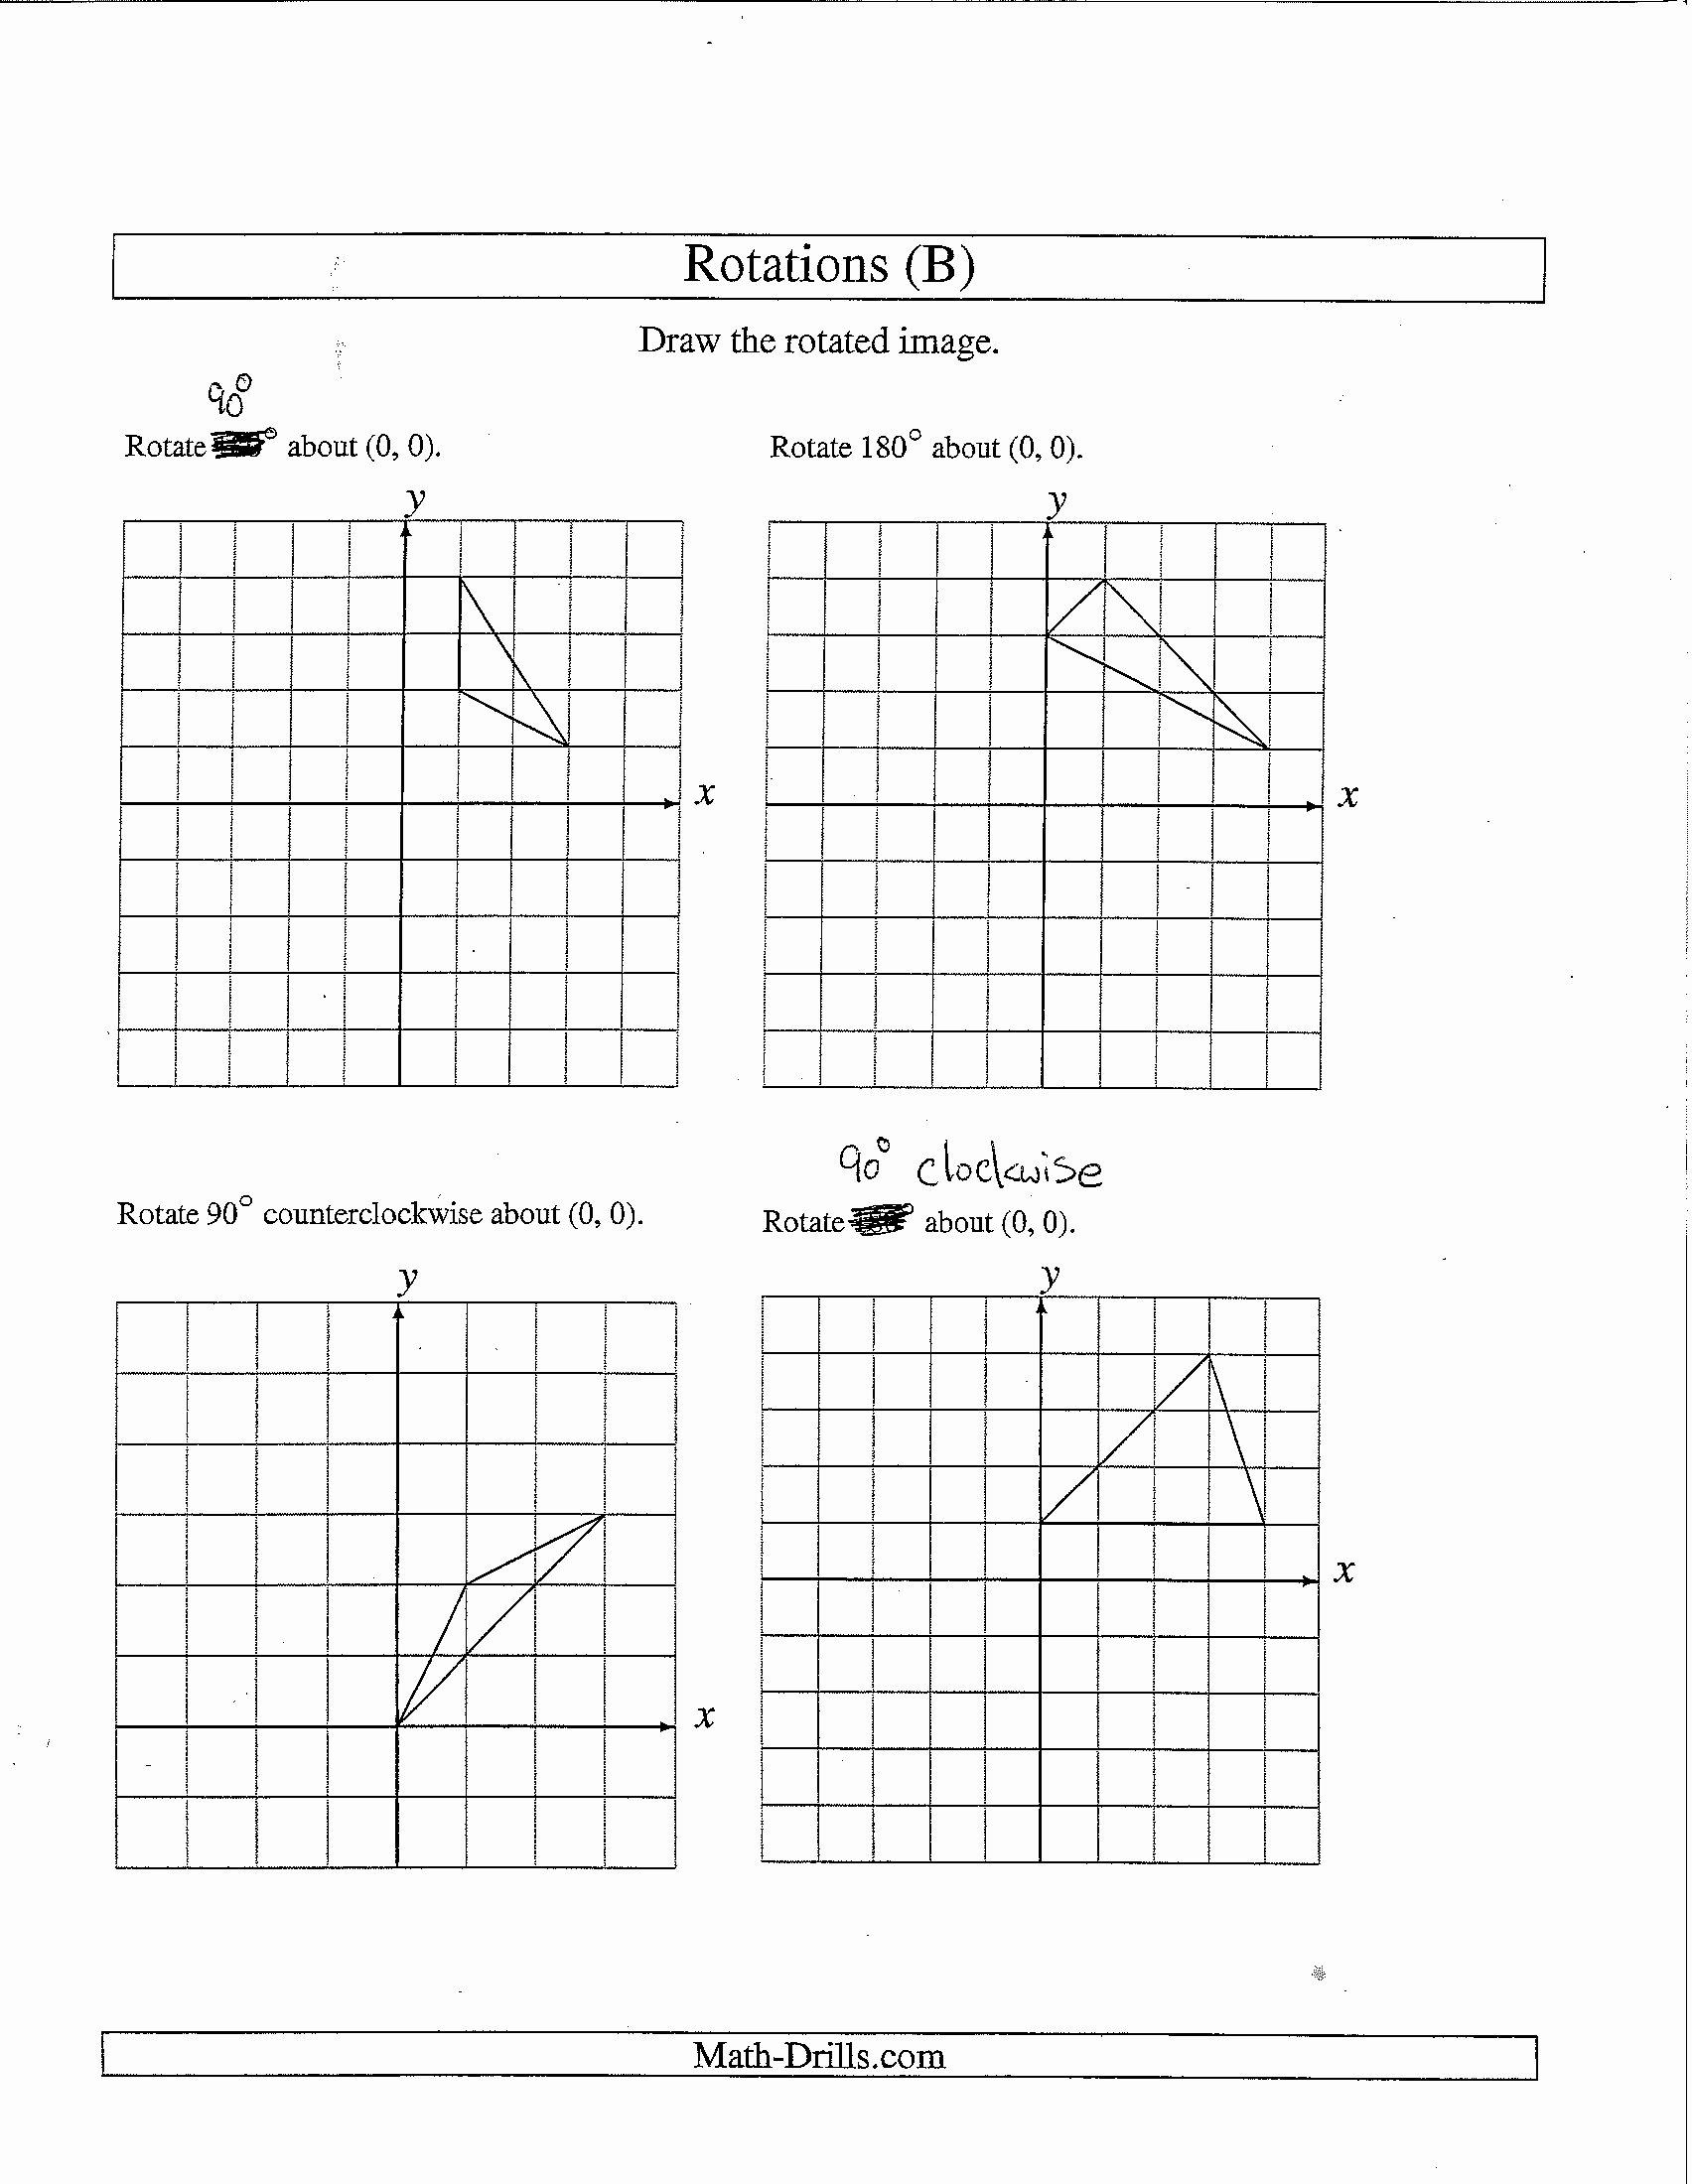 Rotations Worksheet 8th Grade Inspirational Transformations Geometry Worksheet